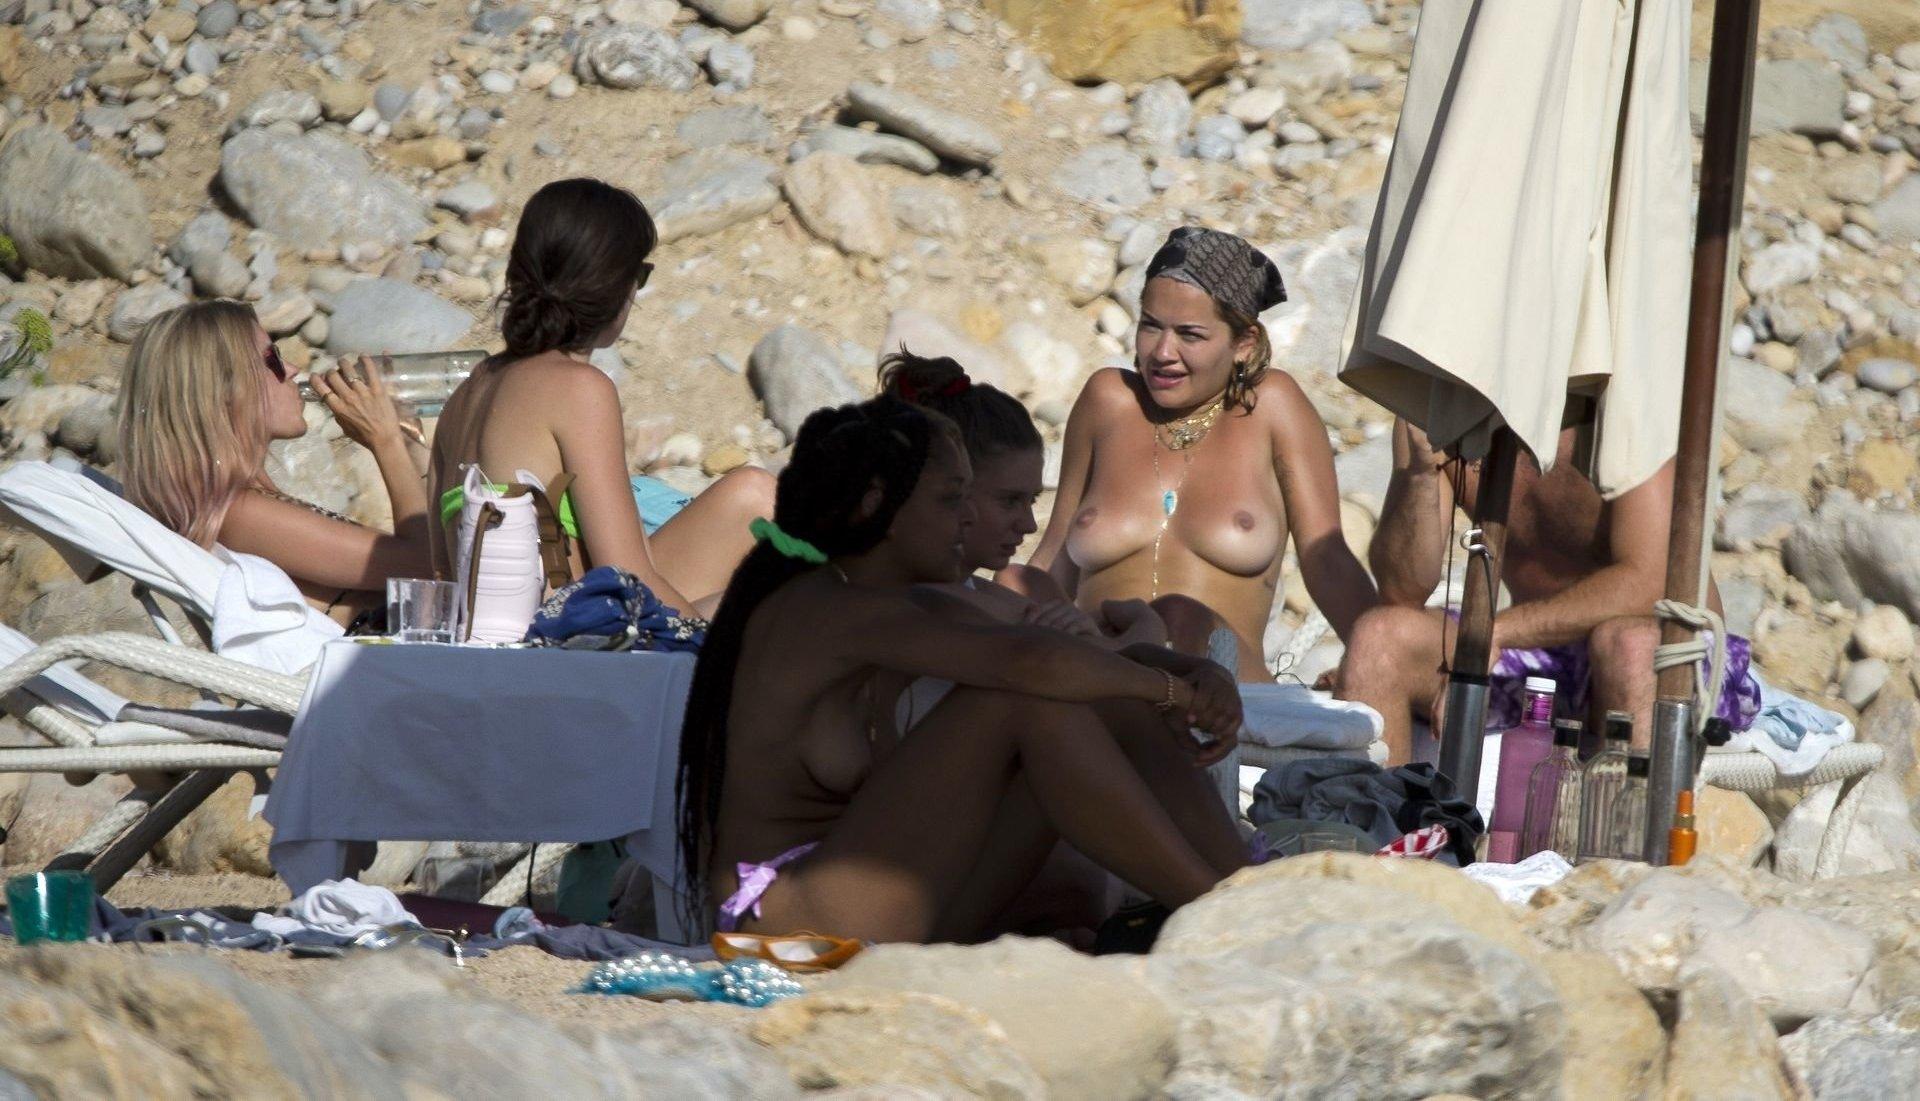 Rita Ora Instagram Nude Leaks 0004